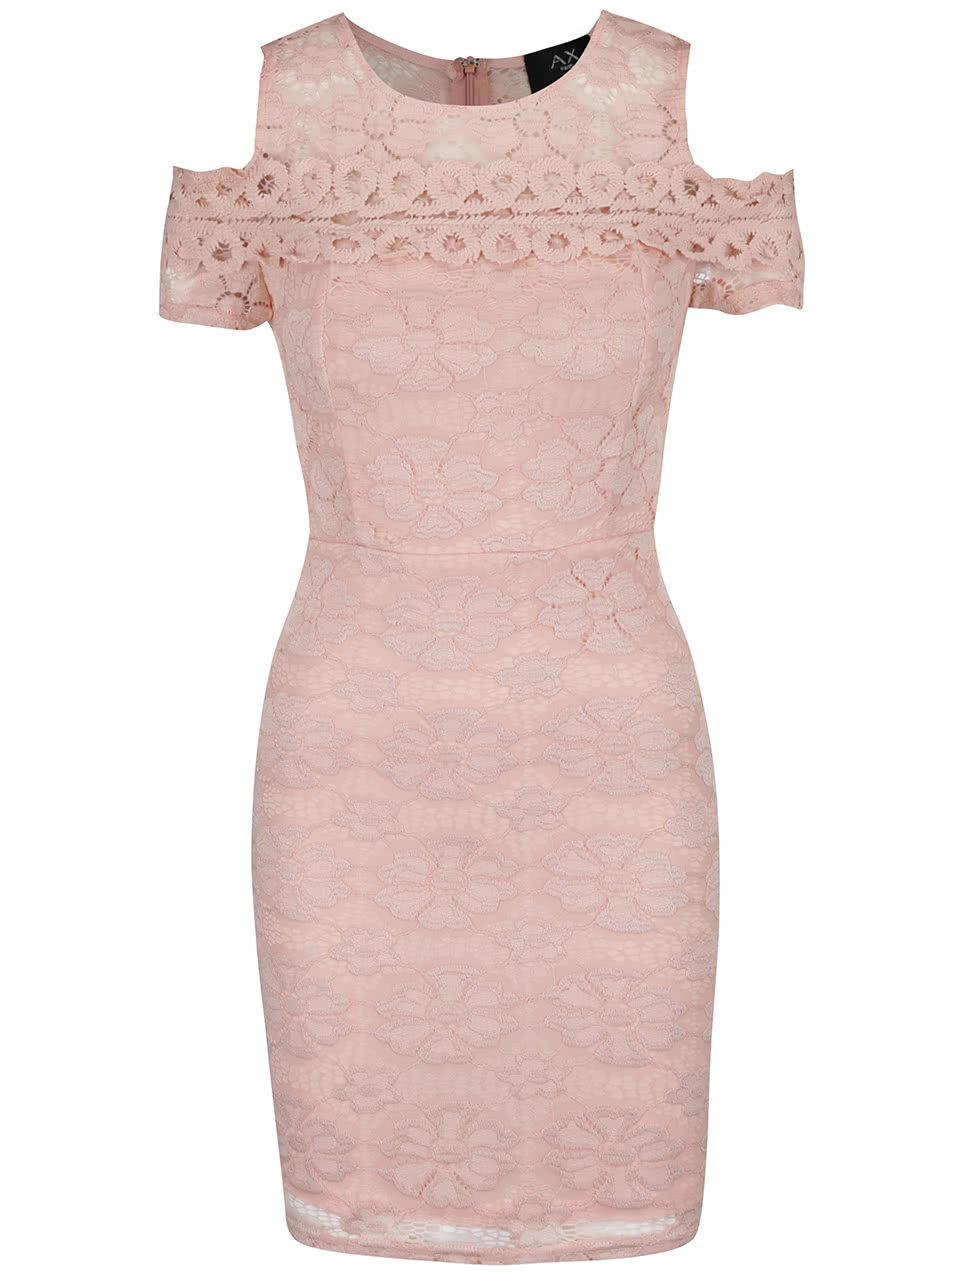 6329f15d6a30 Růžové krajkové šaty s průstřihy na ramenou AX Paris ...